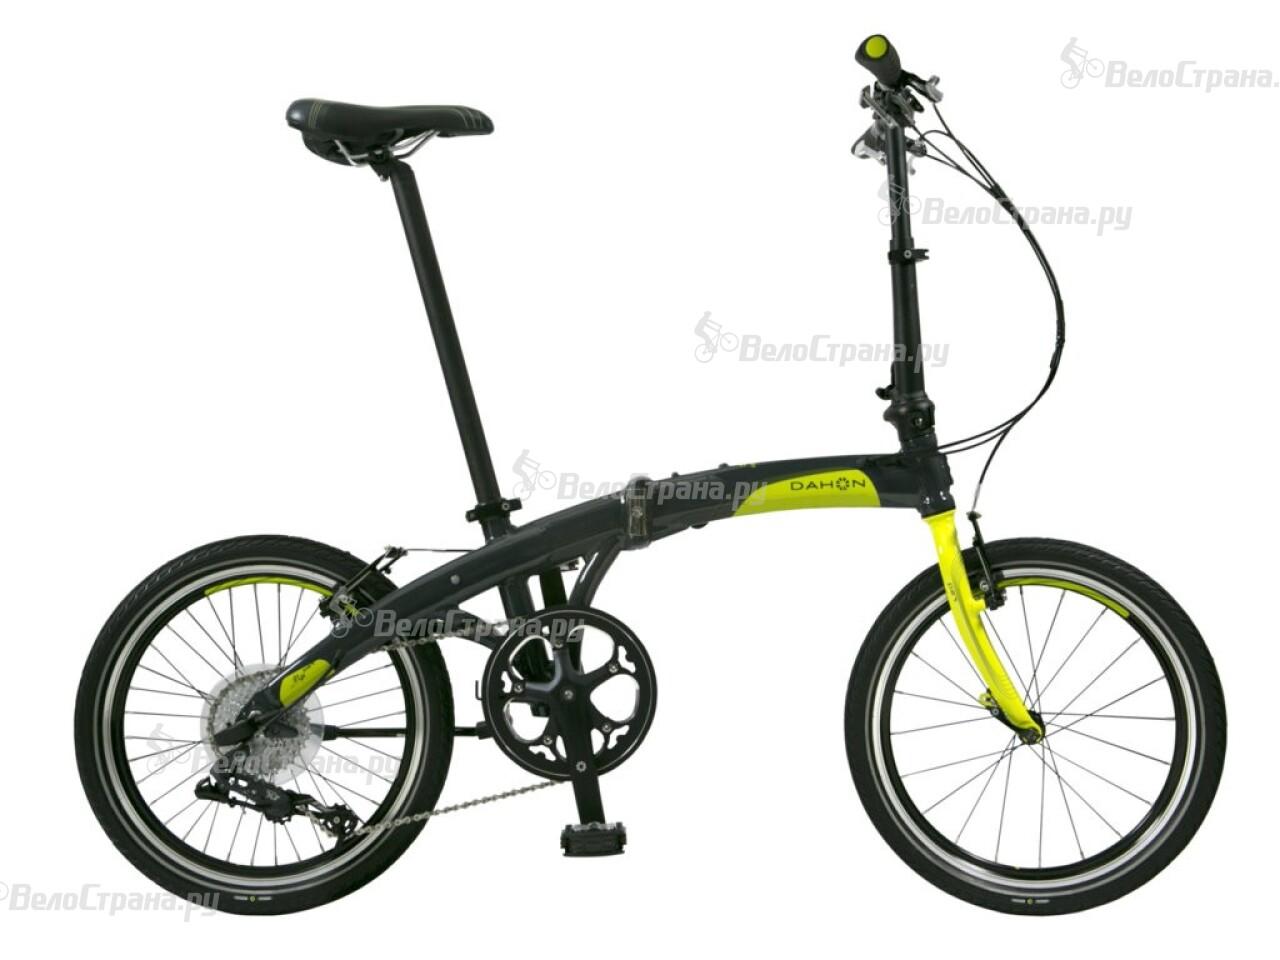 Велосипед Dahon Mu P27 (2014) велосипед dahon speed d7 2014